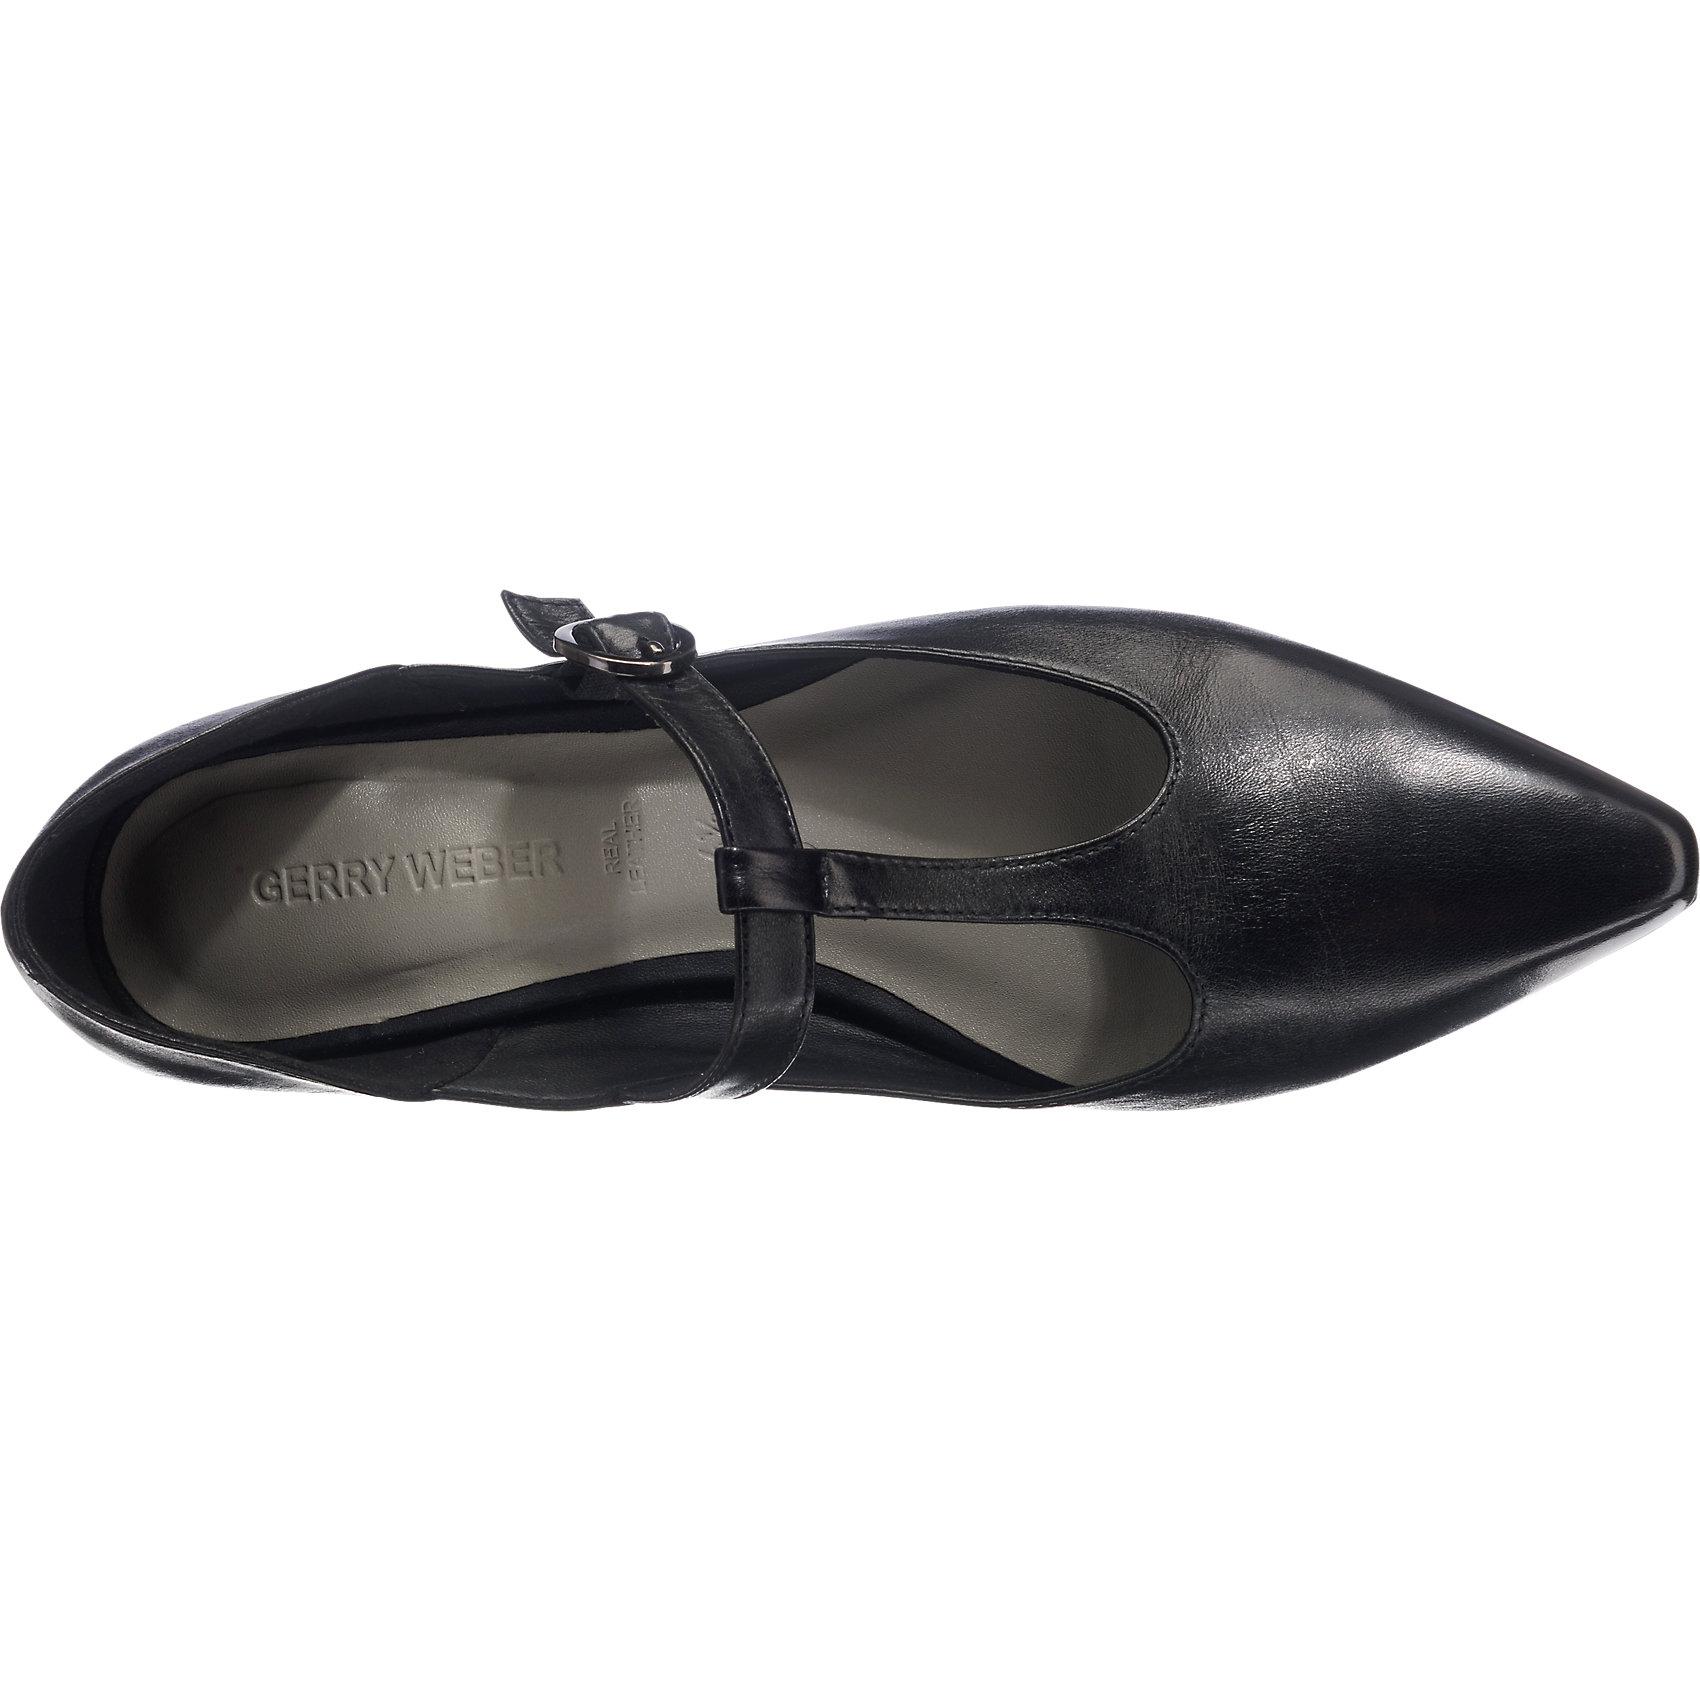 buy popular ec663 fe24b Details zu Neu Gerry Weber Nora Ballerinas schwarz 5766115